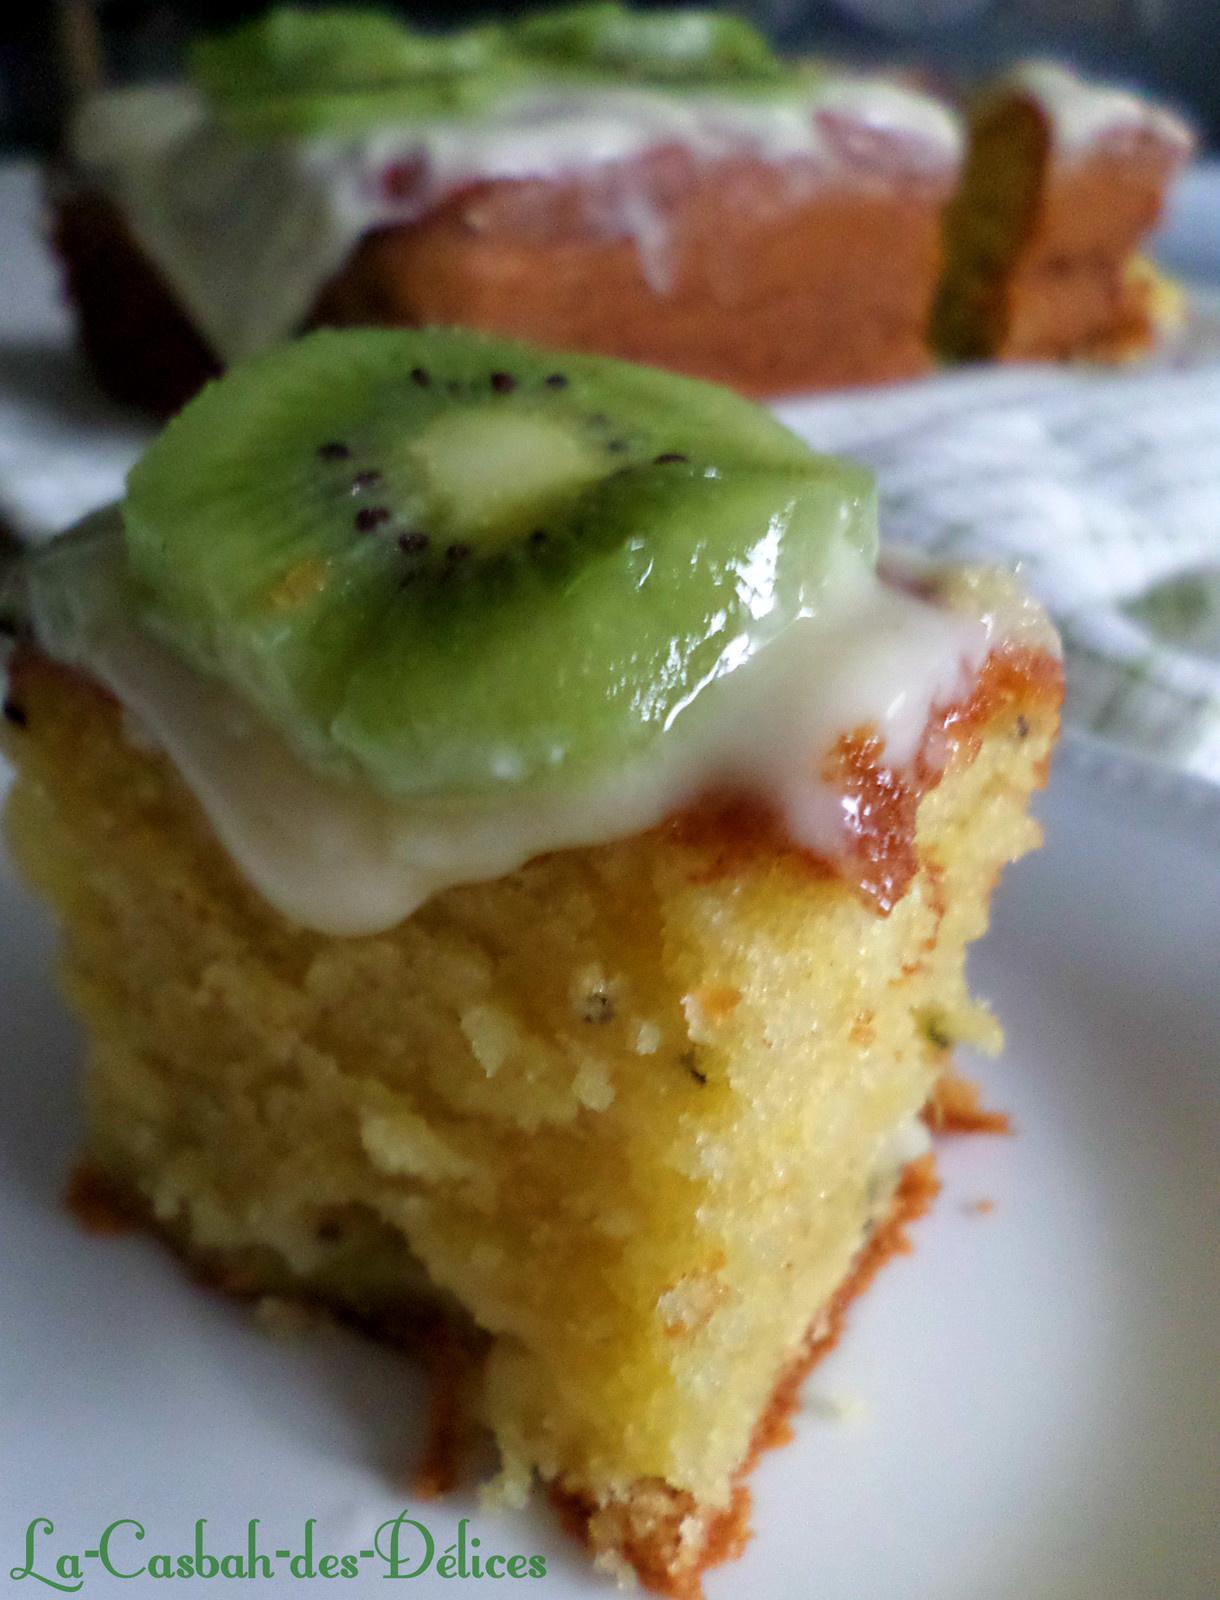 Cake au kiwi et son nappage au citron